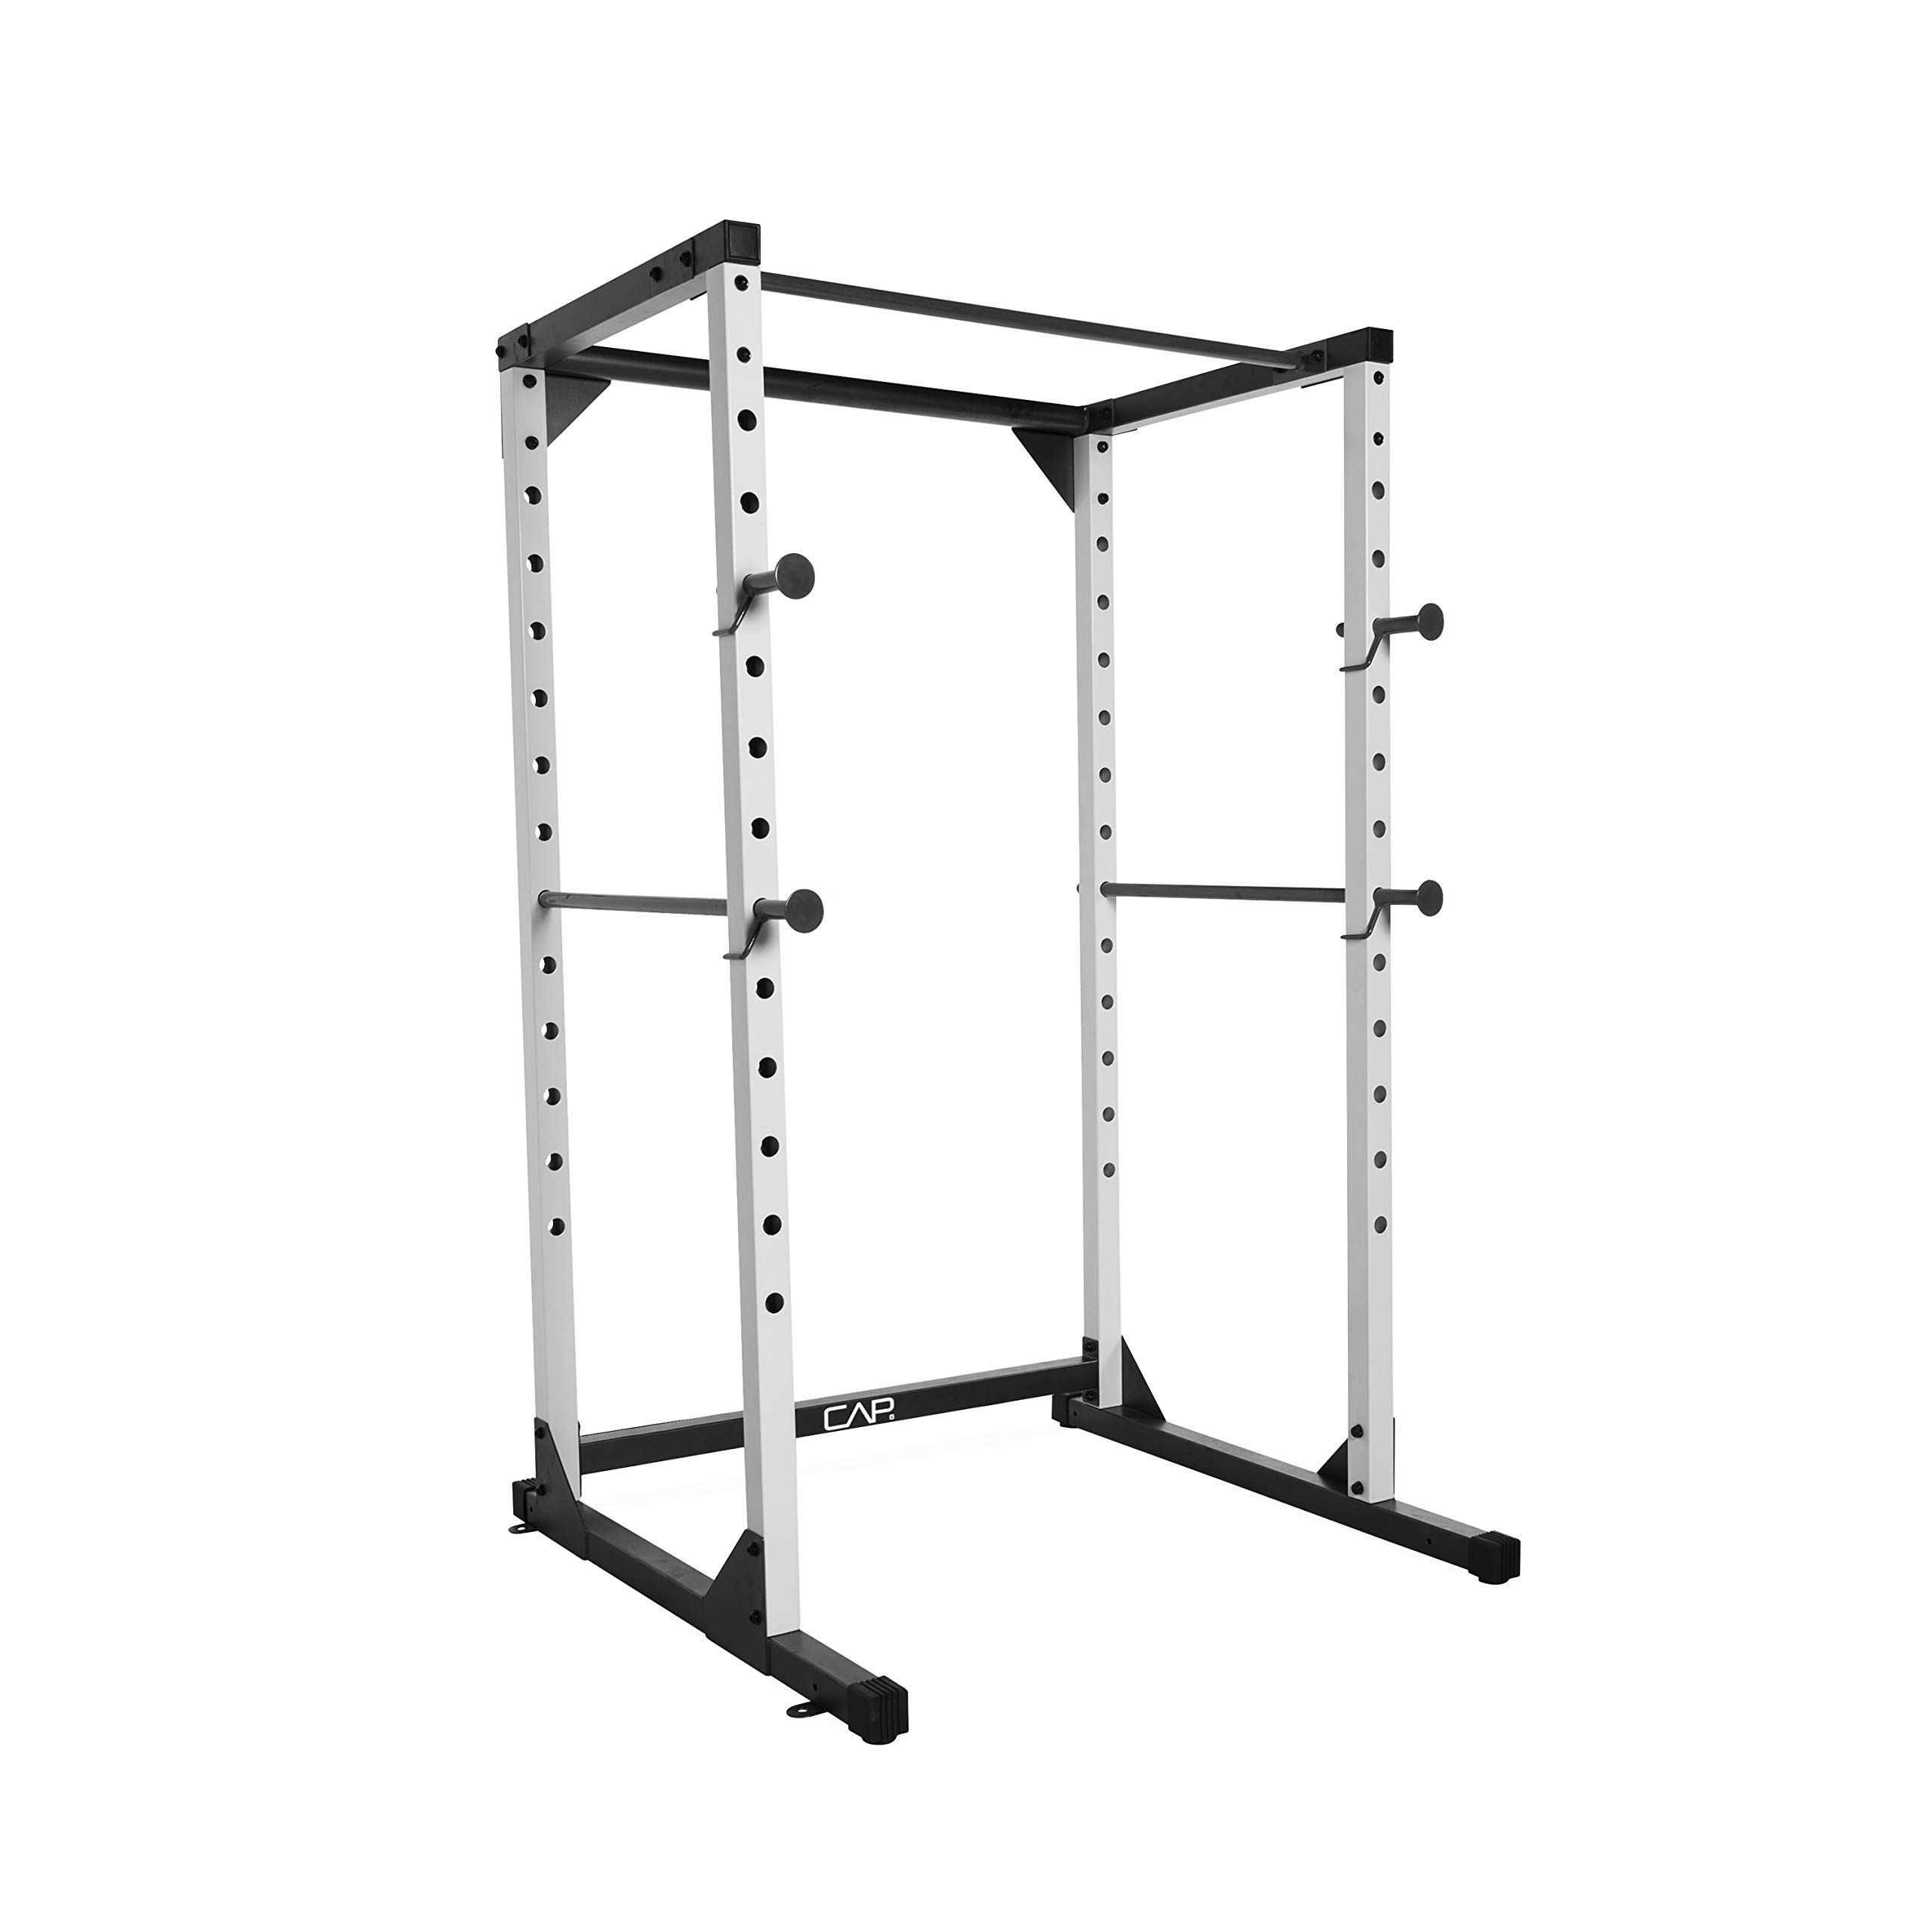 CAP Barbell Full Cage Power Rack, 6-Foot, White